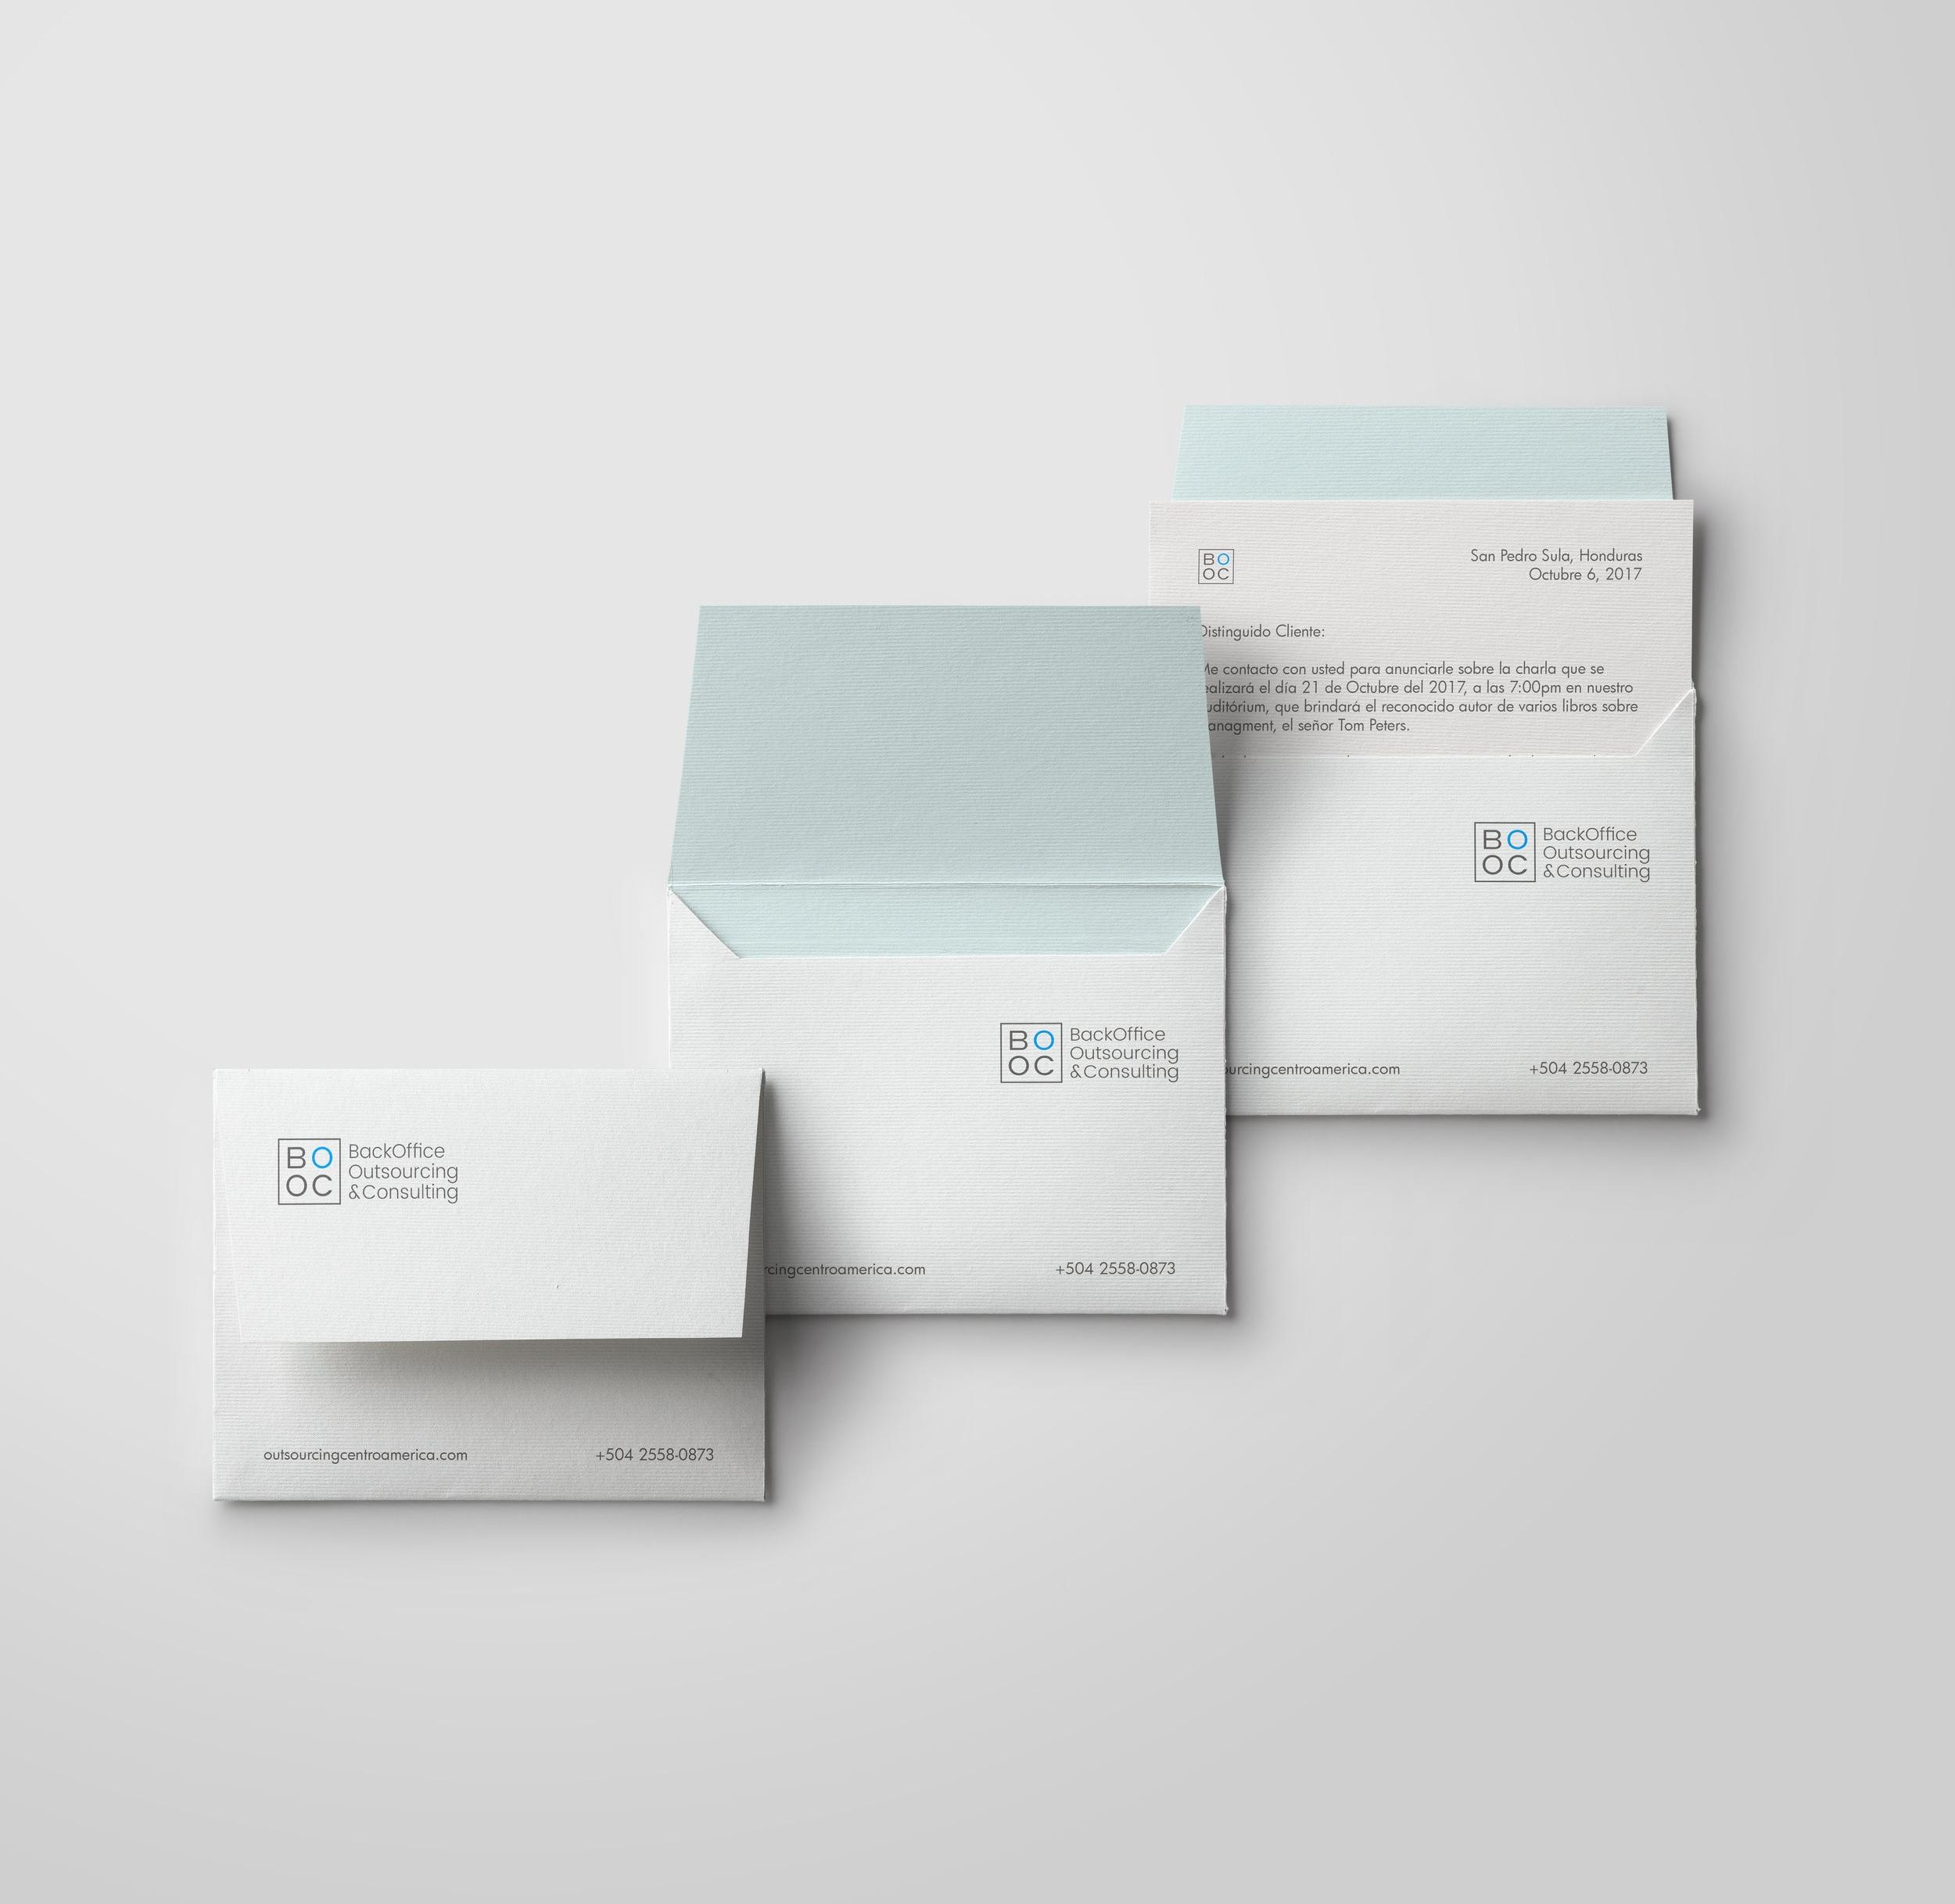 Envelope Mockup BOOC 2.jpg